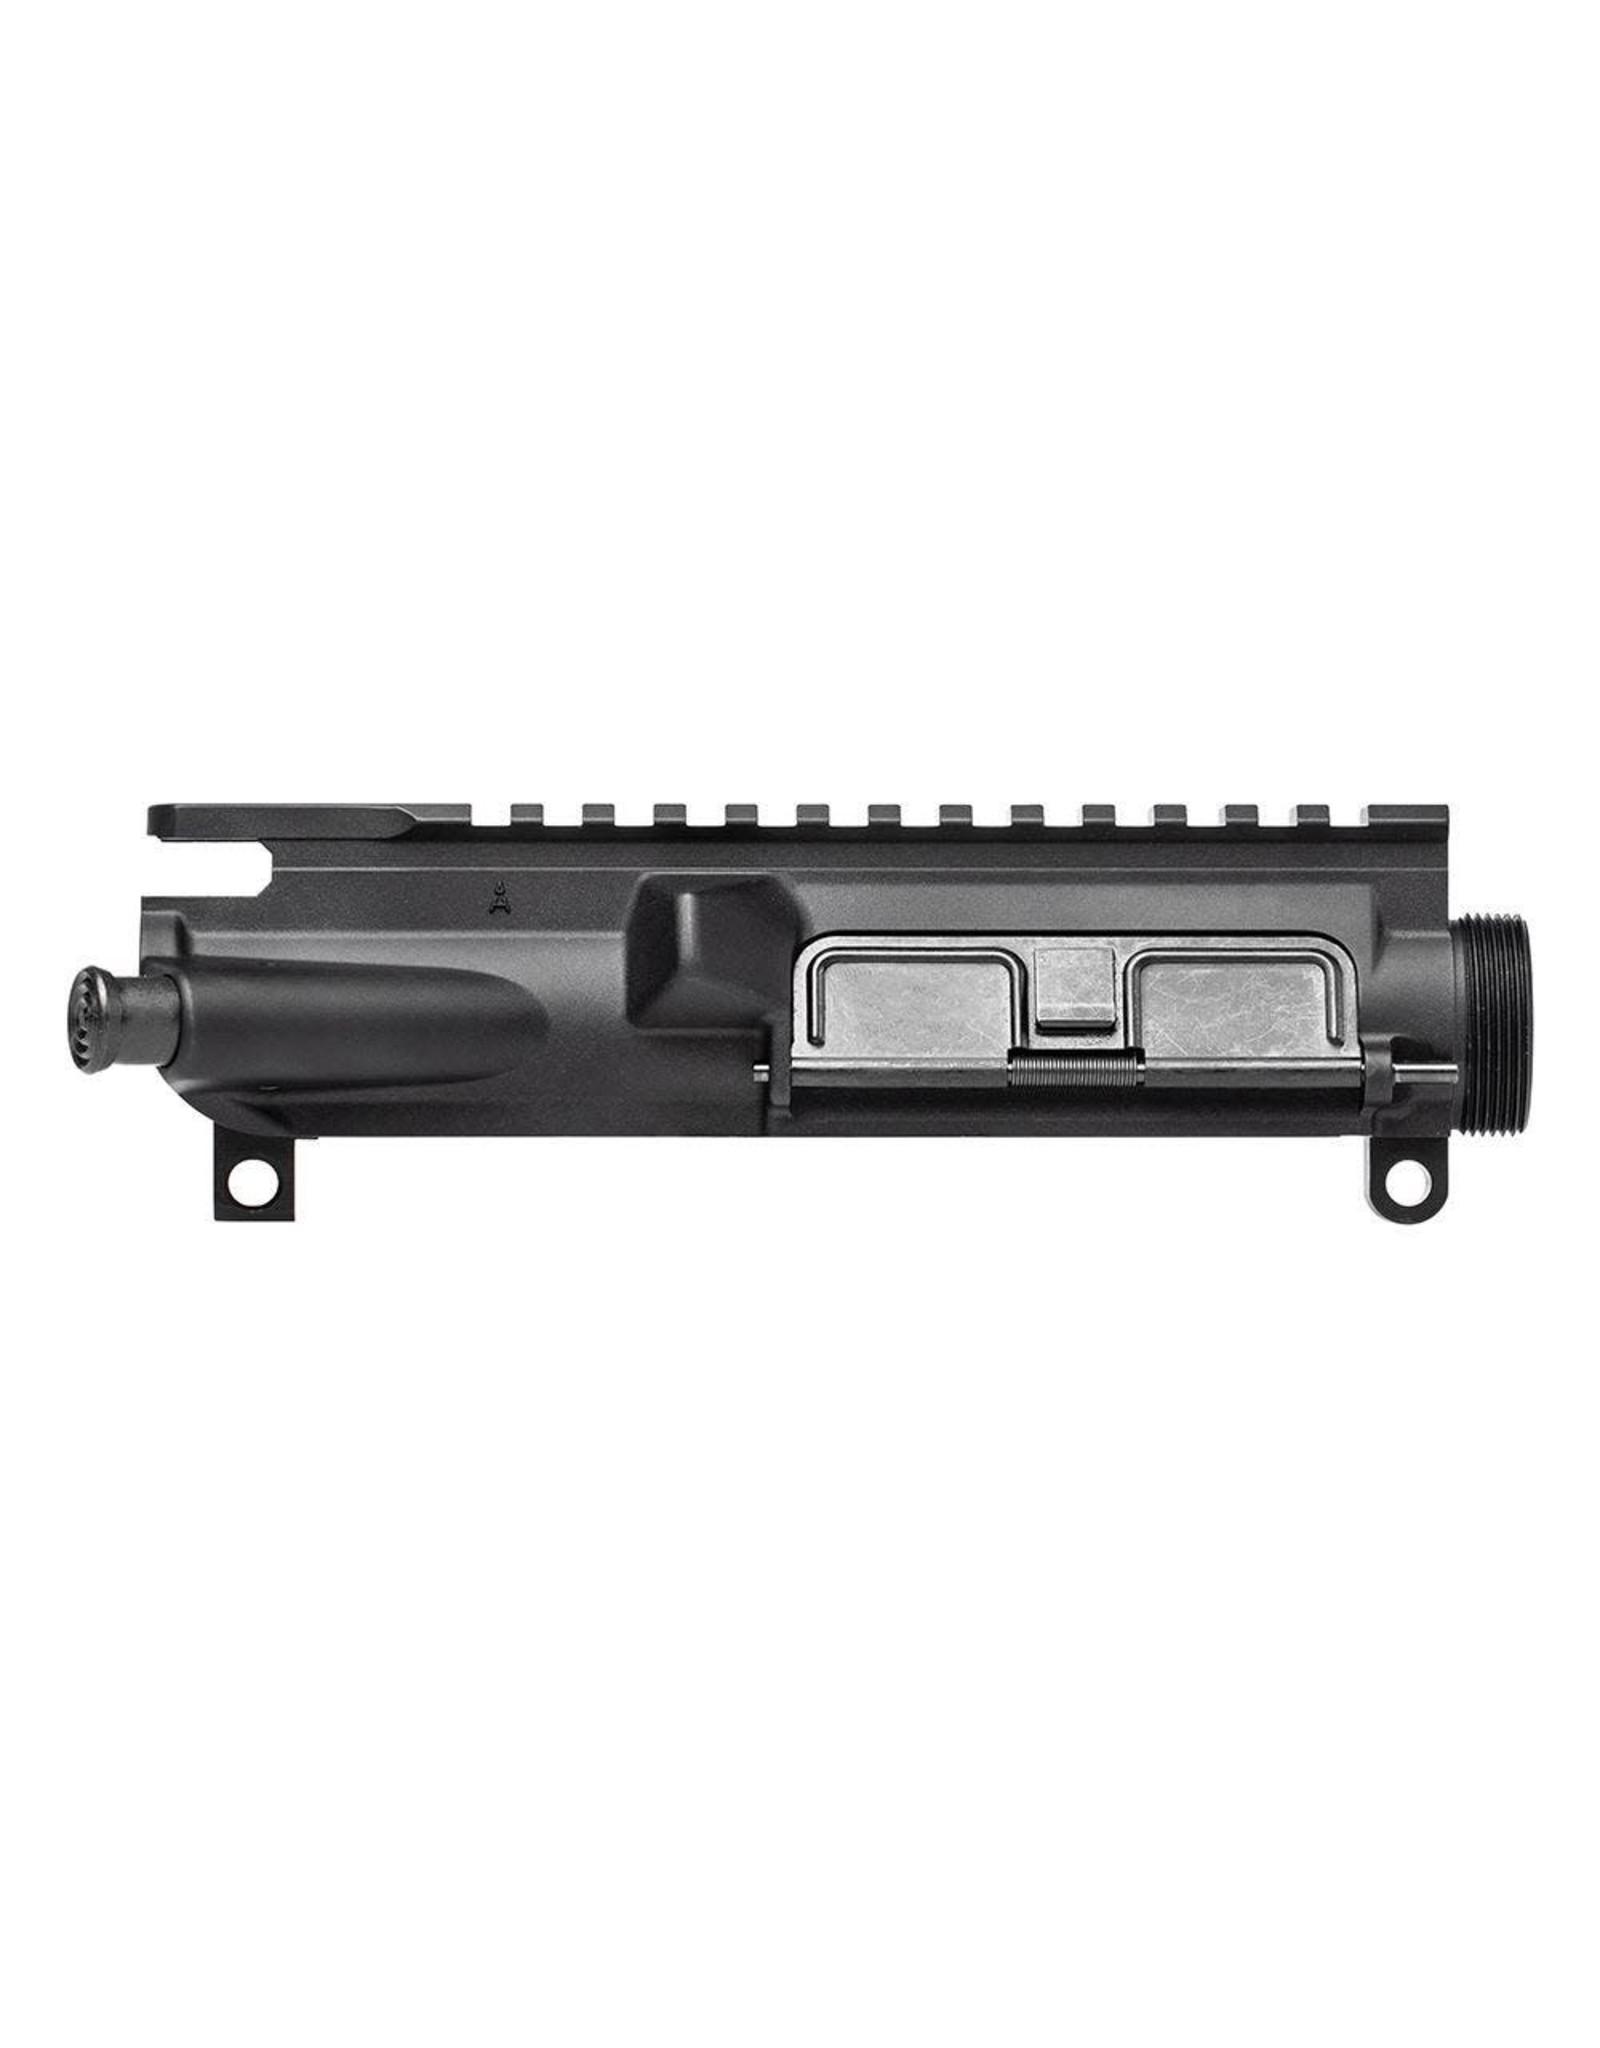 Aero Precision Aero Precision AR15 XL Assembled Upper Receiver - Anodized Black